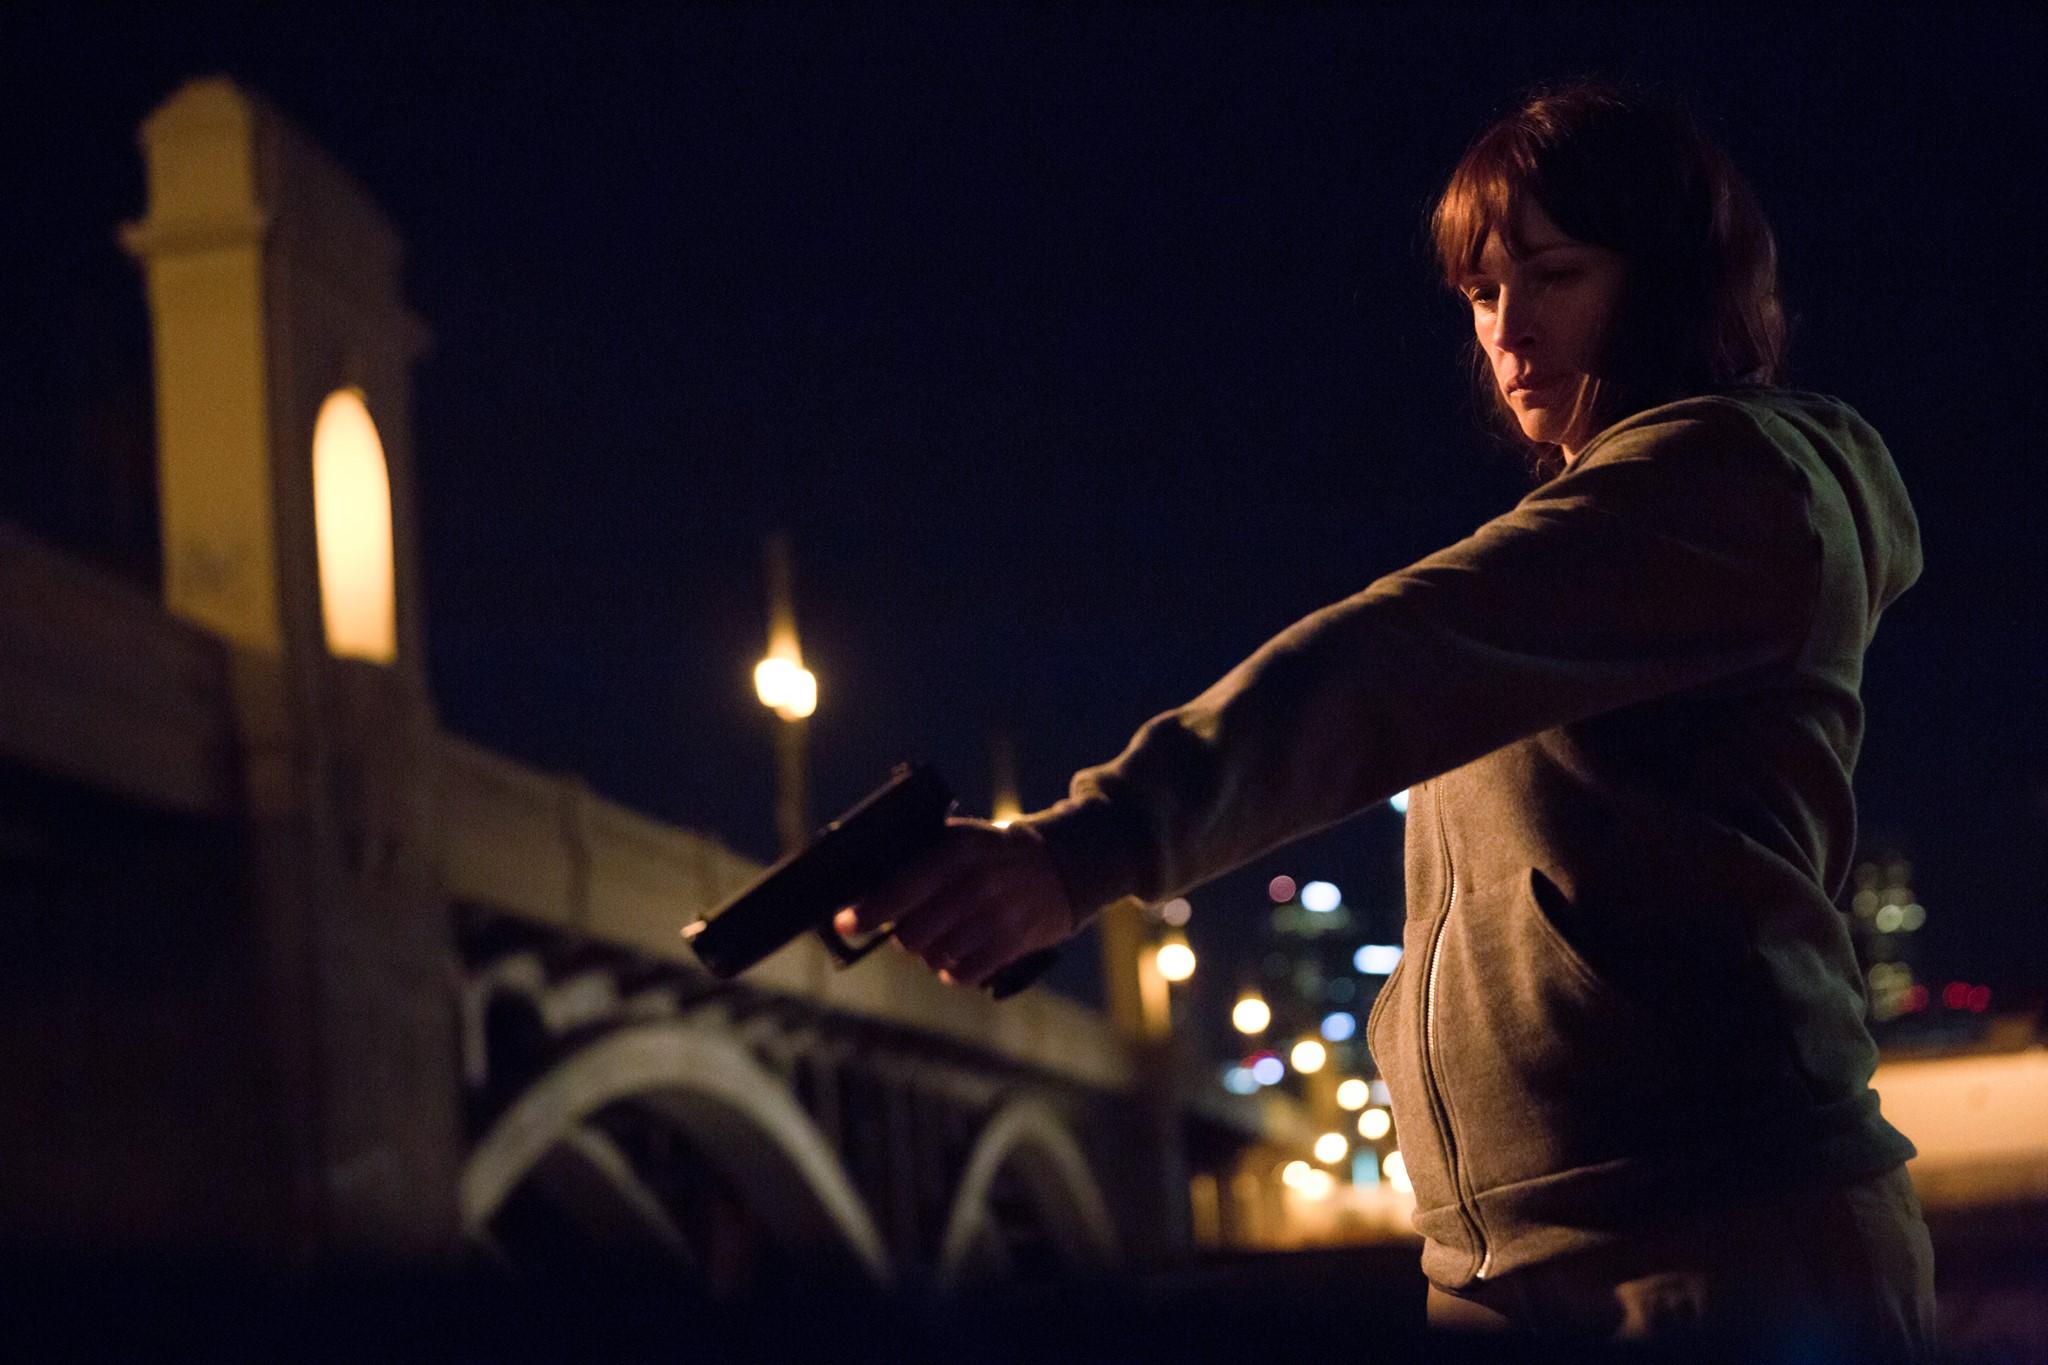 TRAILER: Julia Roberts Stars In Remake of Argentina's Oscar-Winning 'El Secreto de sus Ojos'